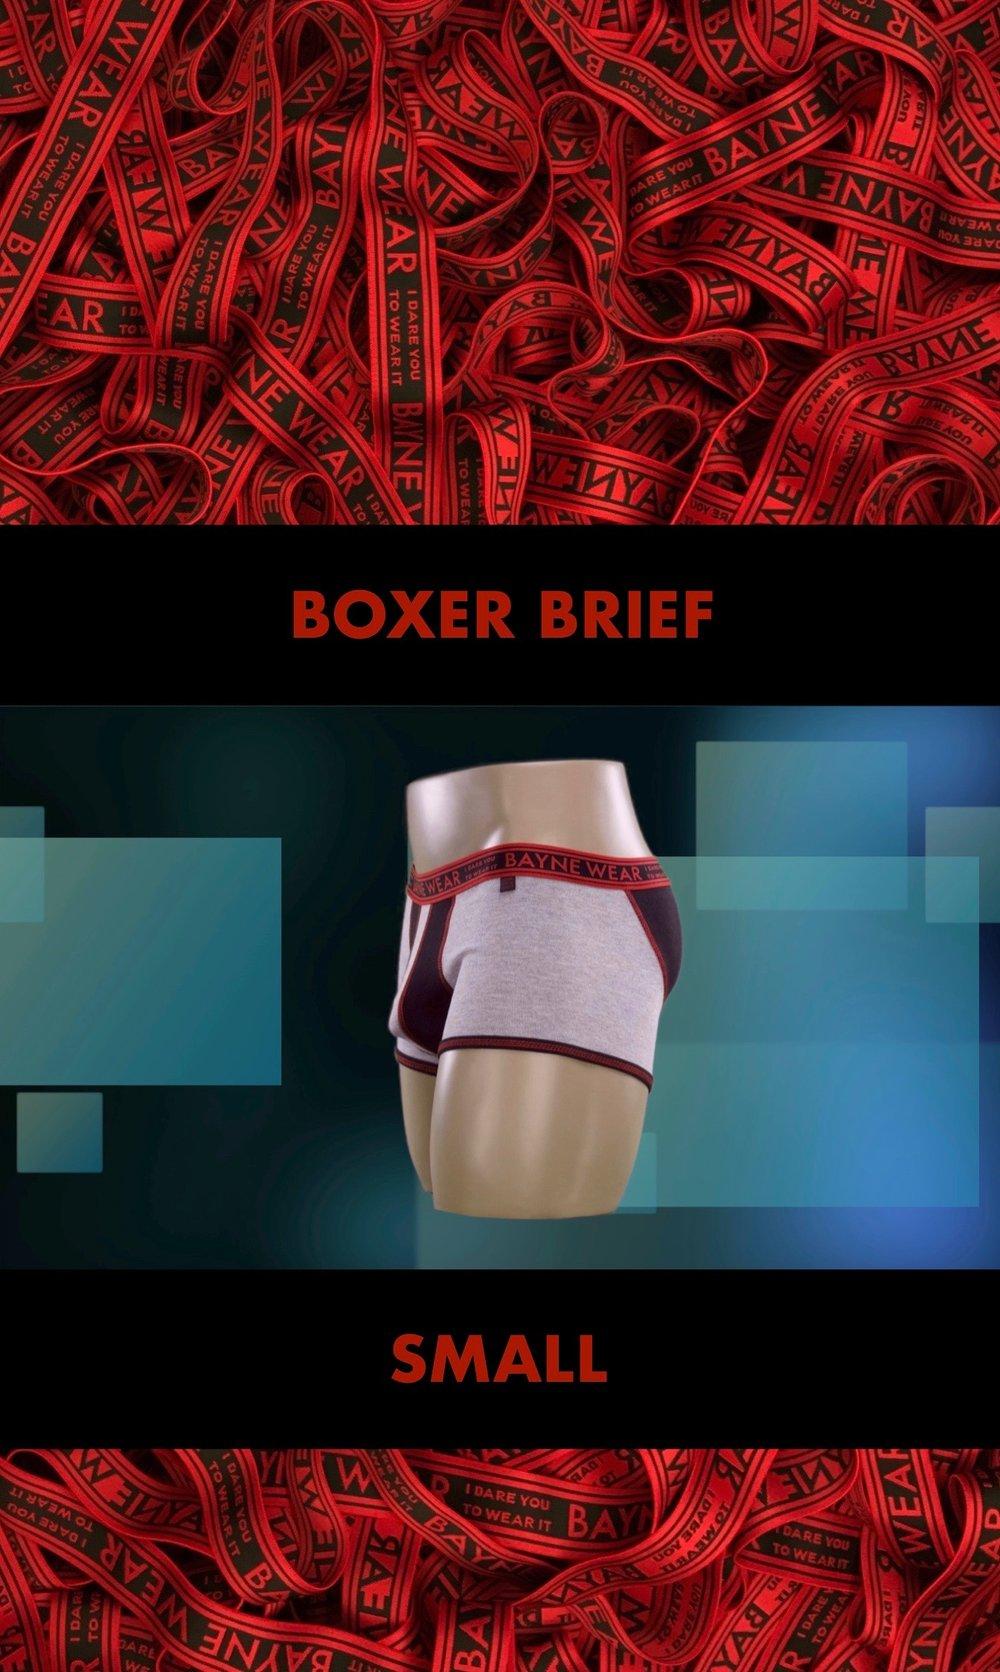 GARMENT TAG 2018 BACK BOXER BRIEF SMALL 2.jpg